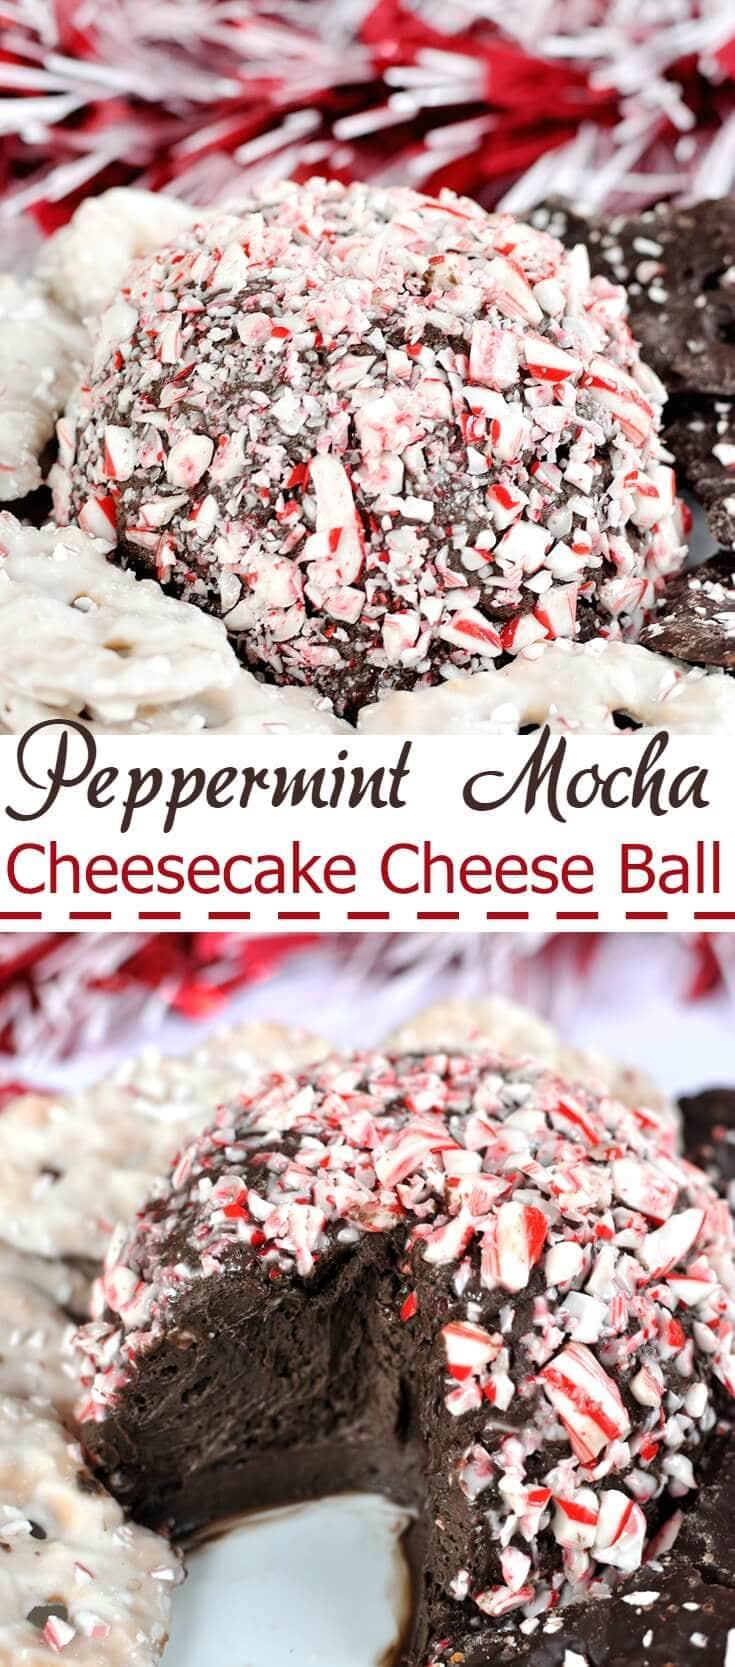 peppermint mocha cheesecake cheese ball recipe